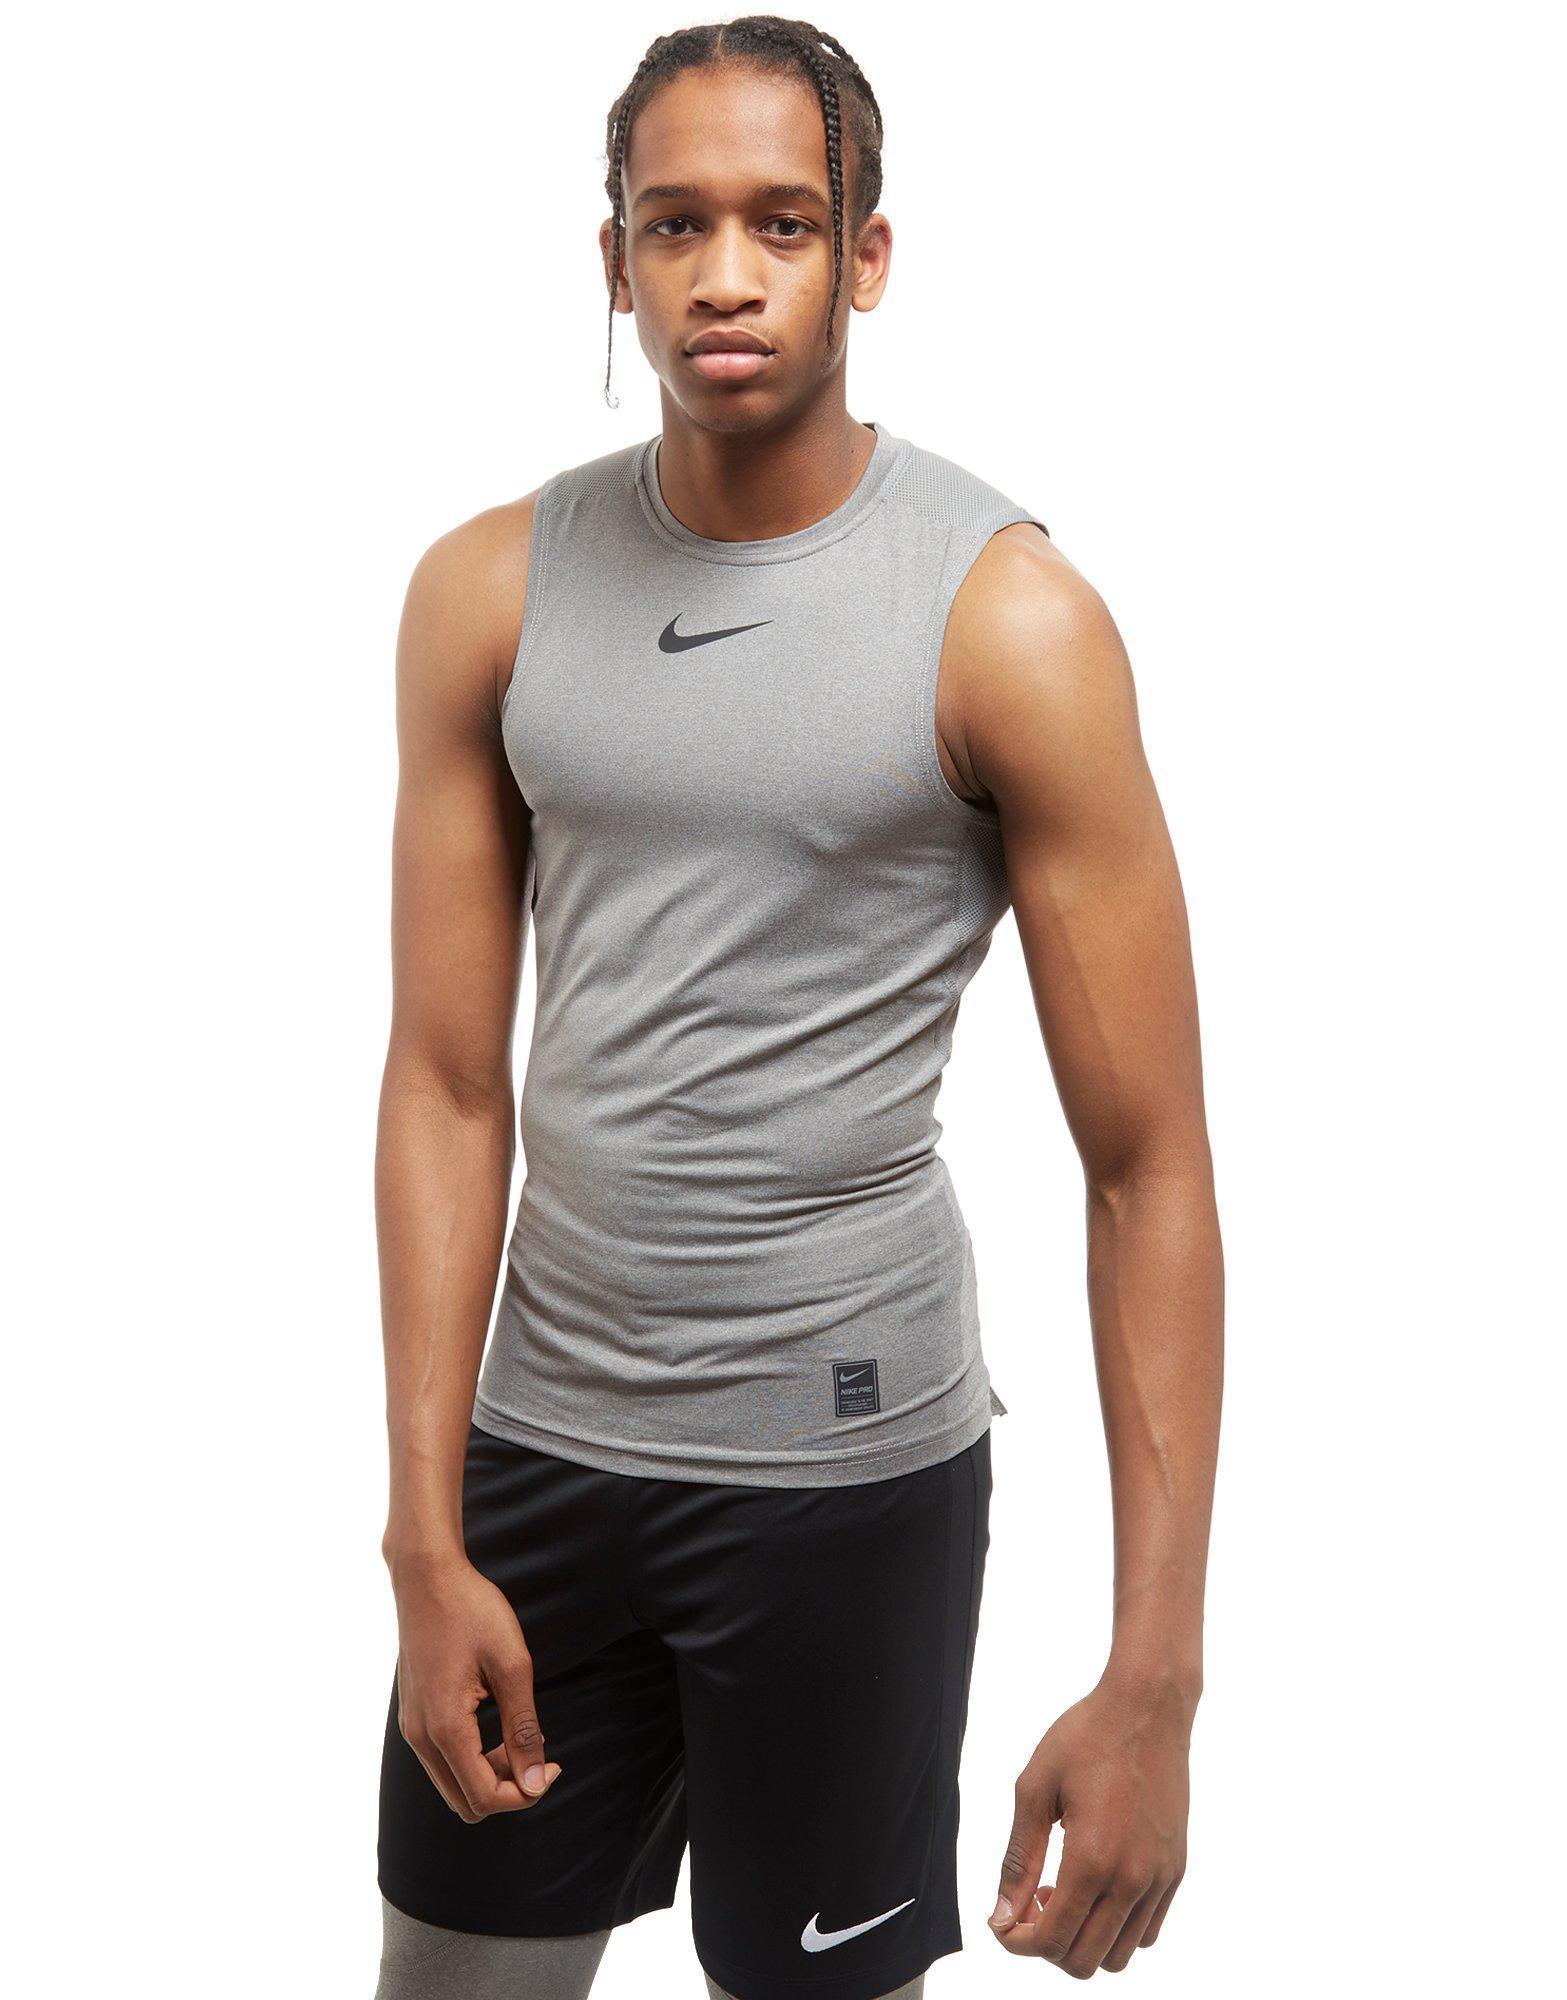 Custom Nike Dri Fit Compression Shirt Lauren Goss